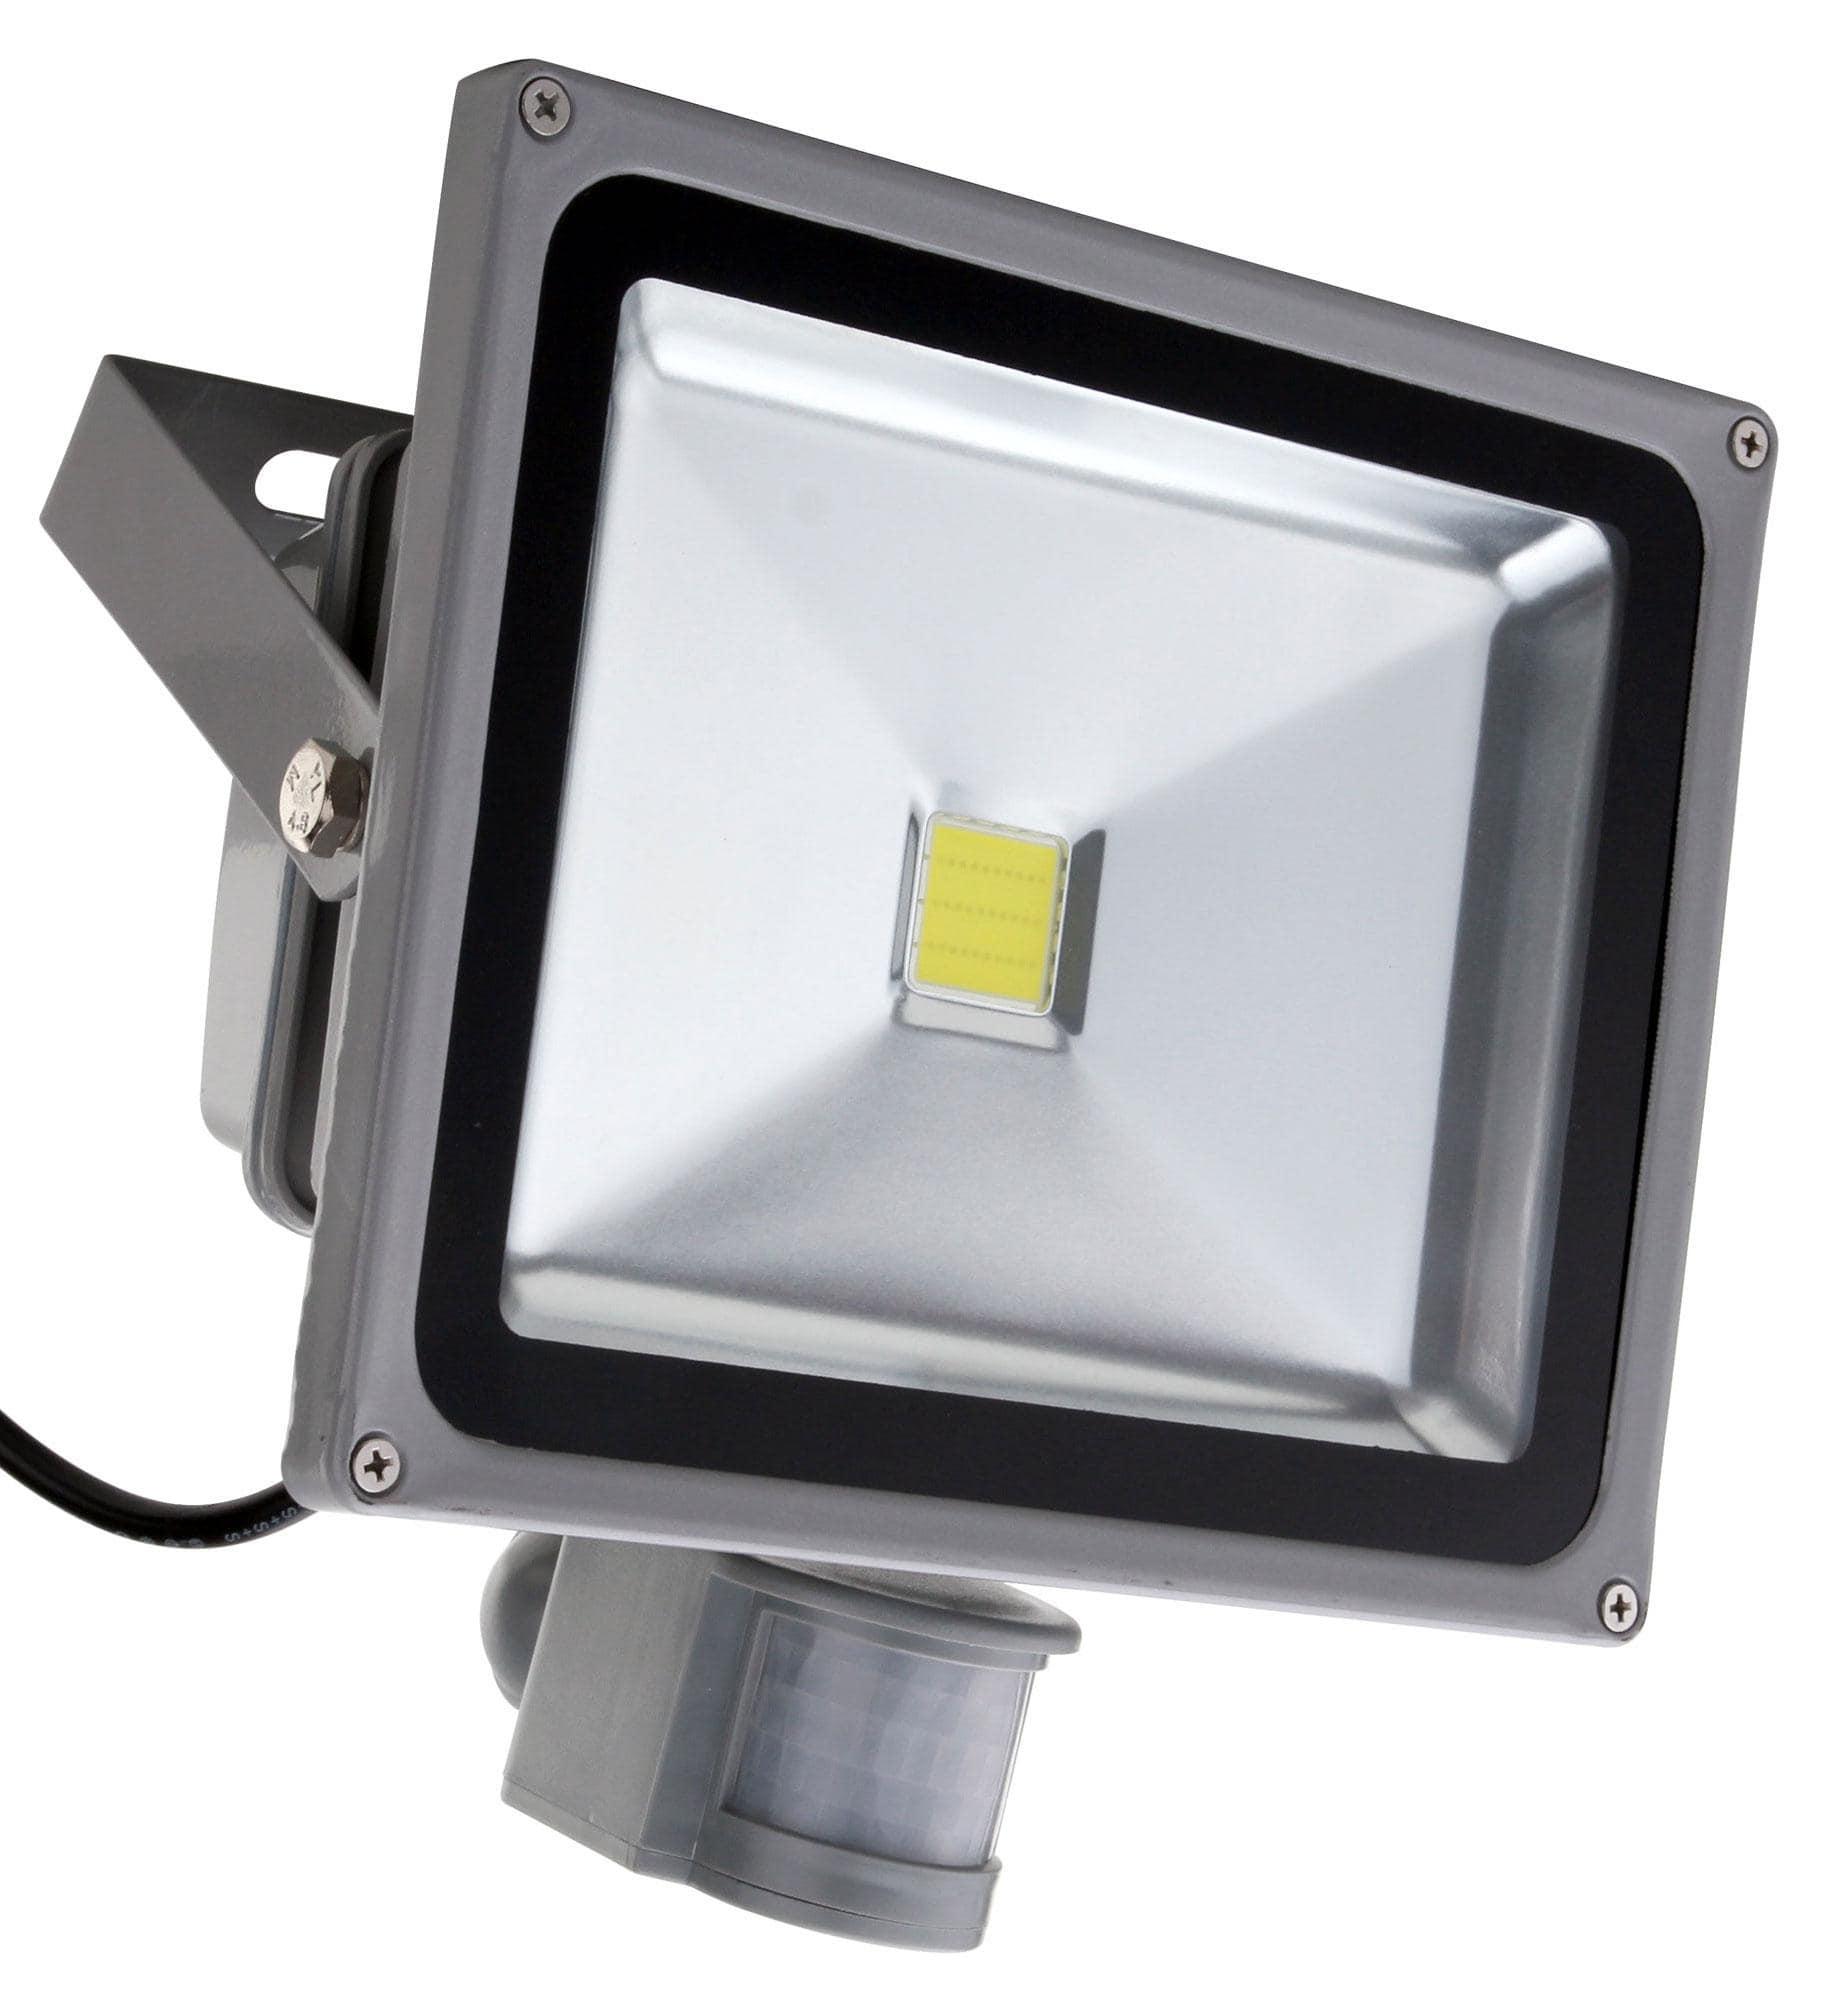 showlite fl 2030b led fluter ip65 30 watt 3300 lumen. Black Bedroom Furniture Sets. Home Design Ideas